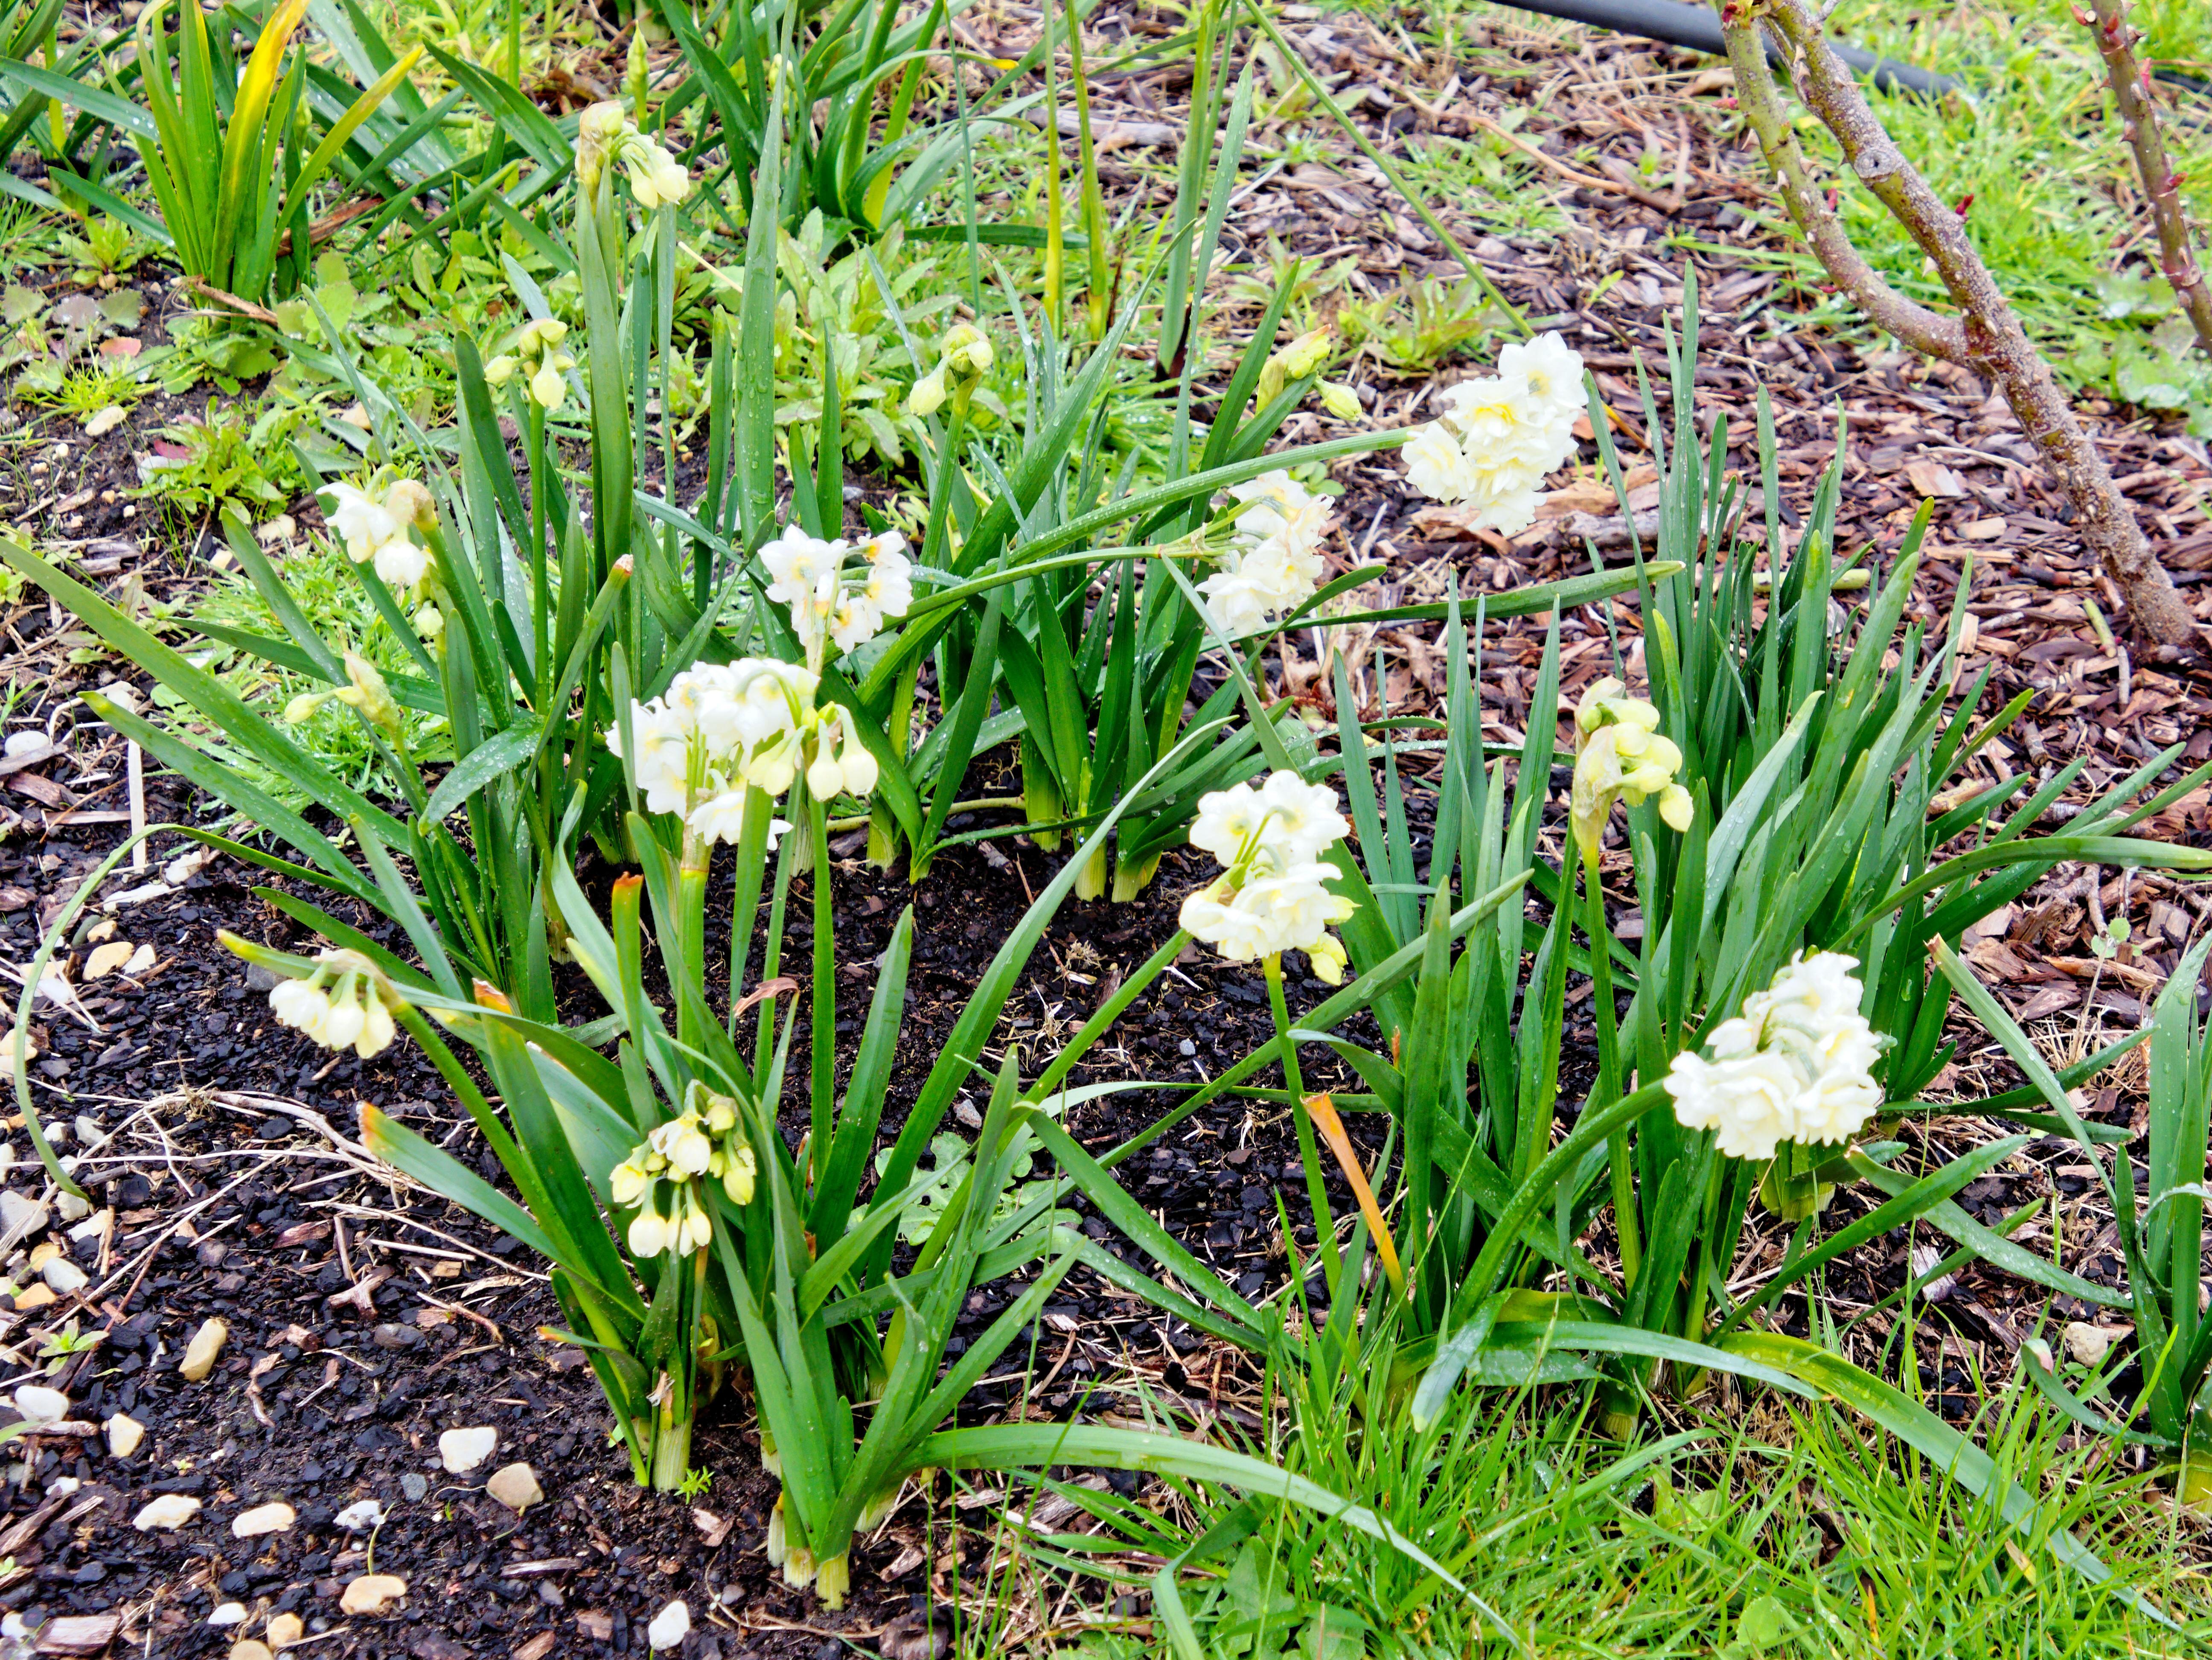 Narcissus-2.jpeg